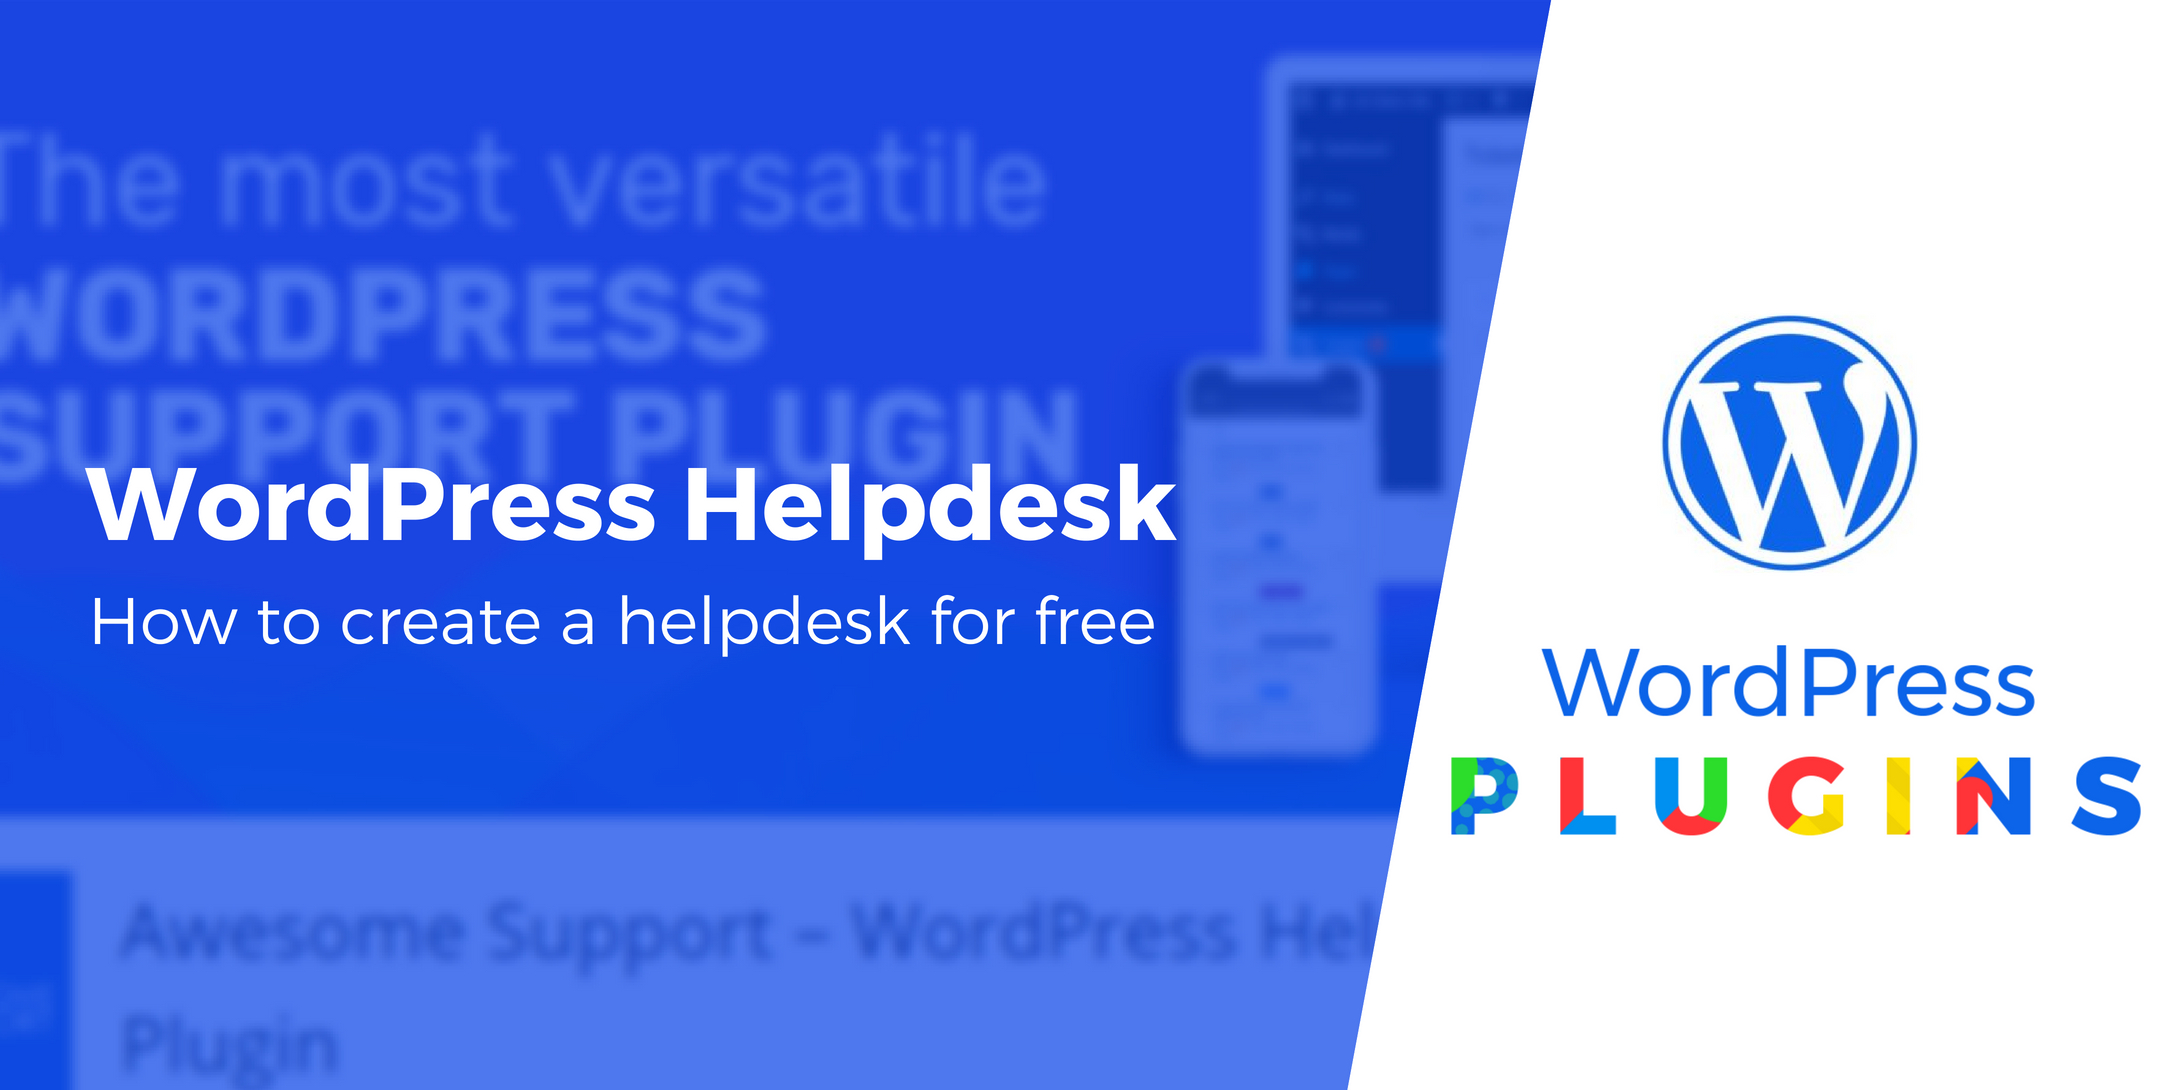 WordPress helpdesk